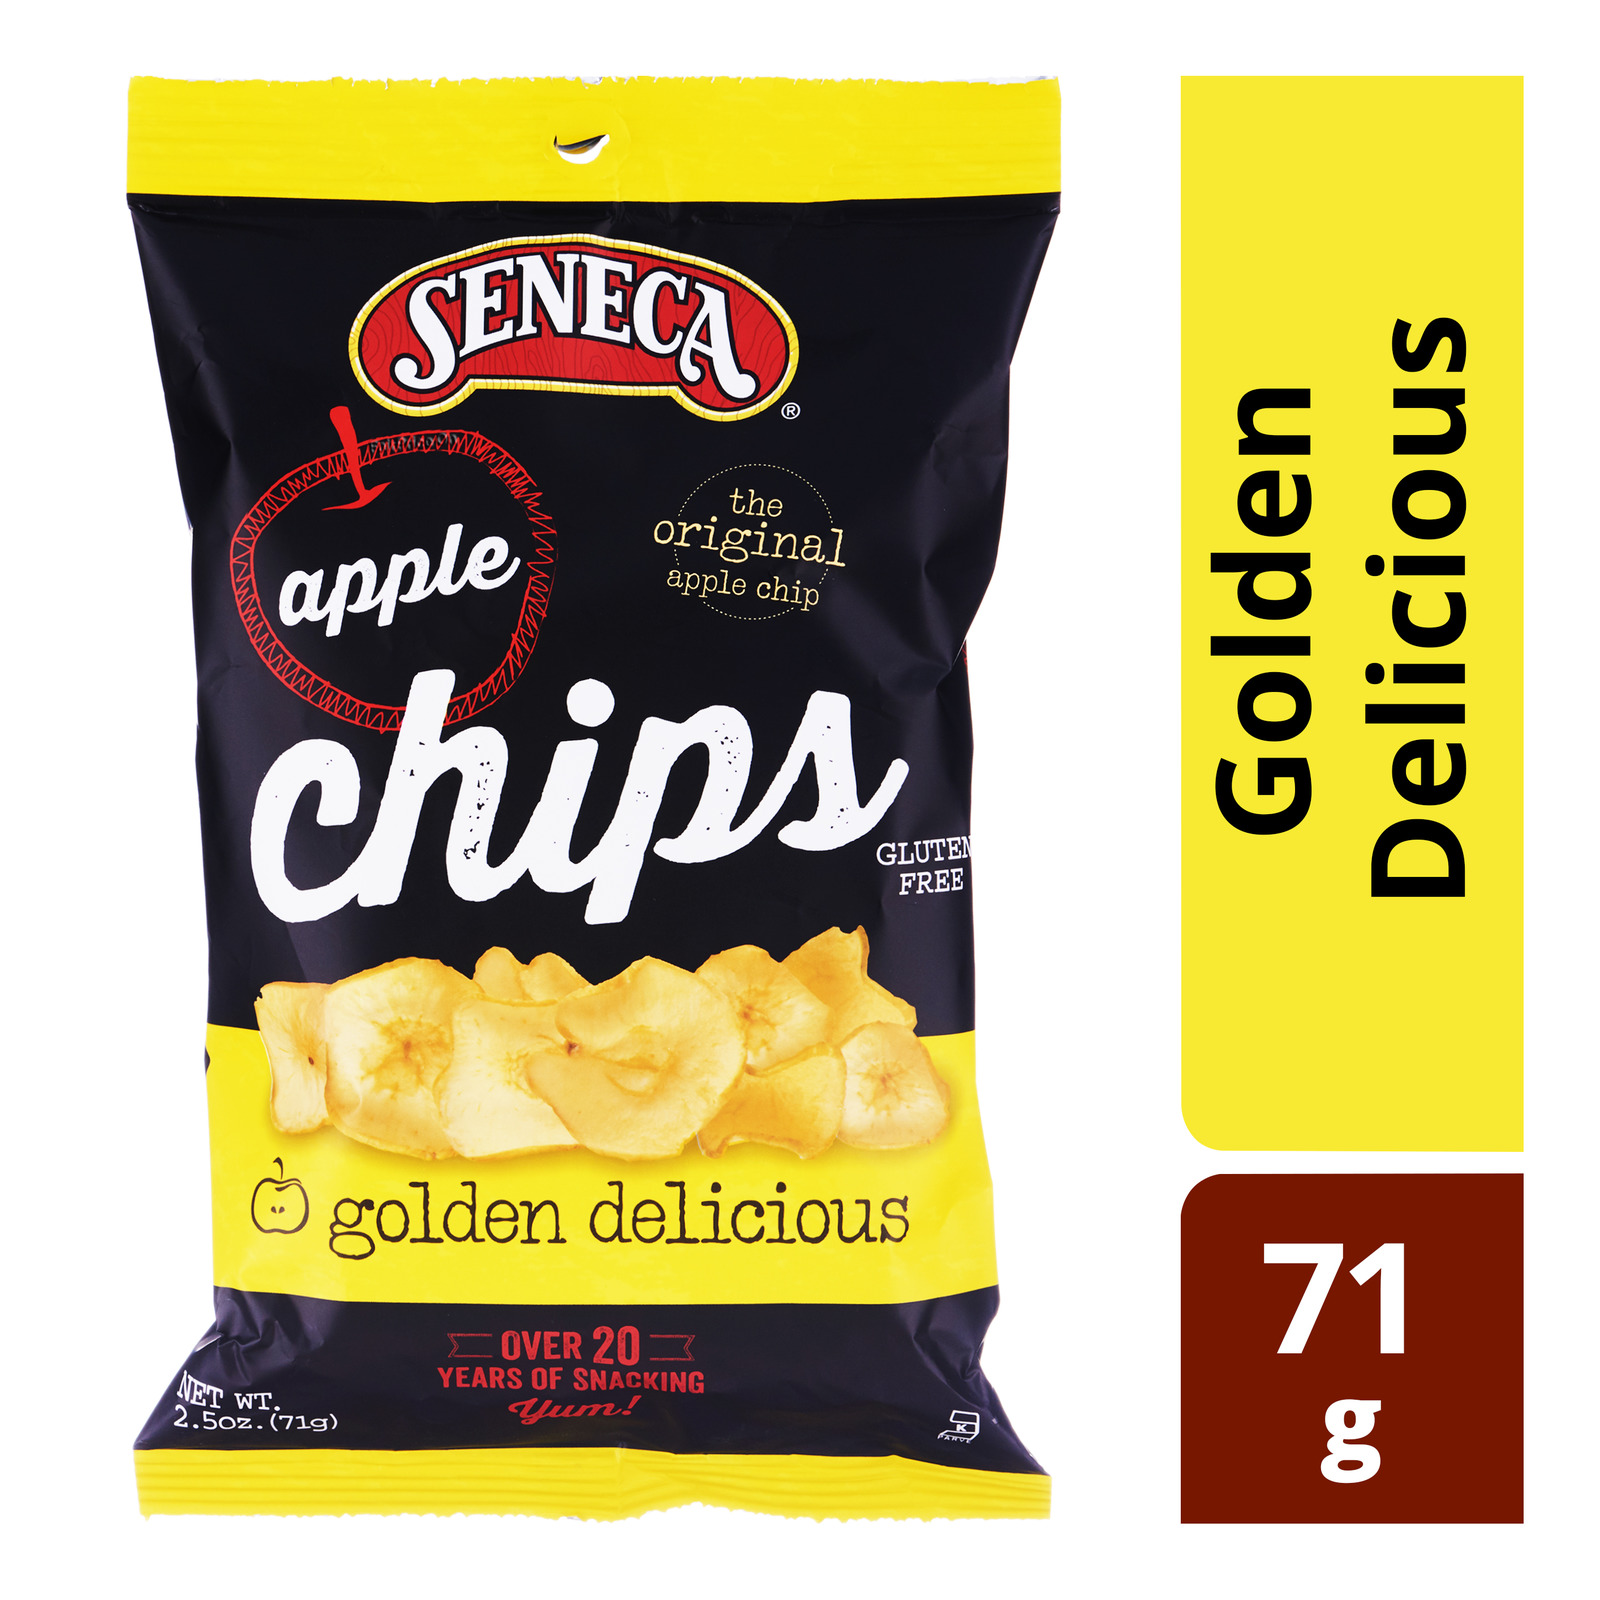 Seneca Crispy Apple Chips - Golden Delicious